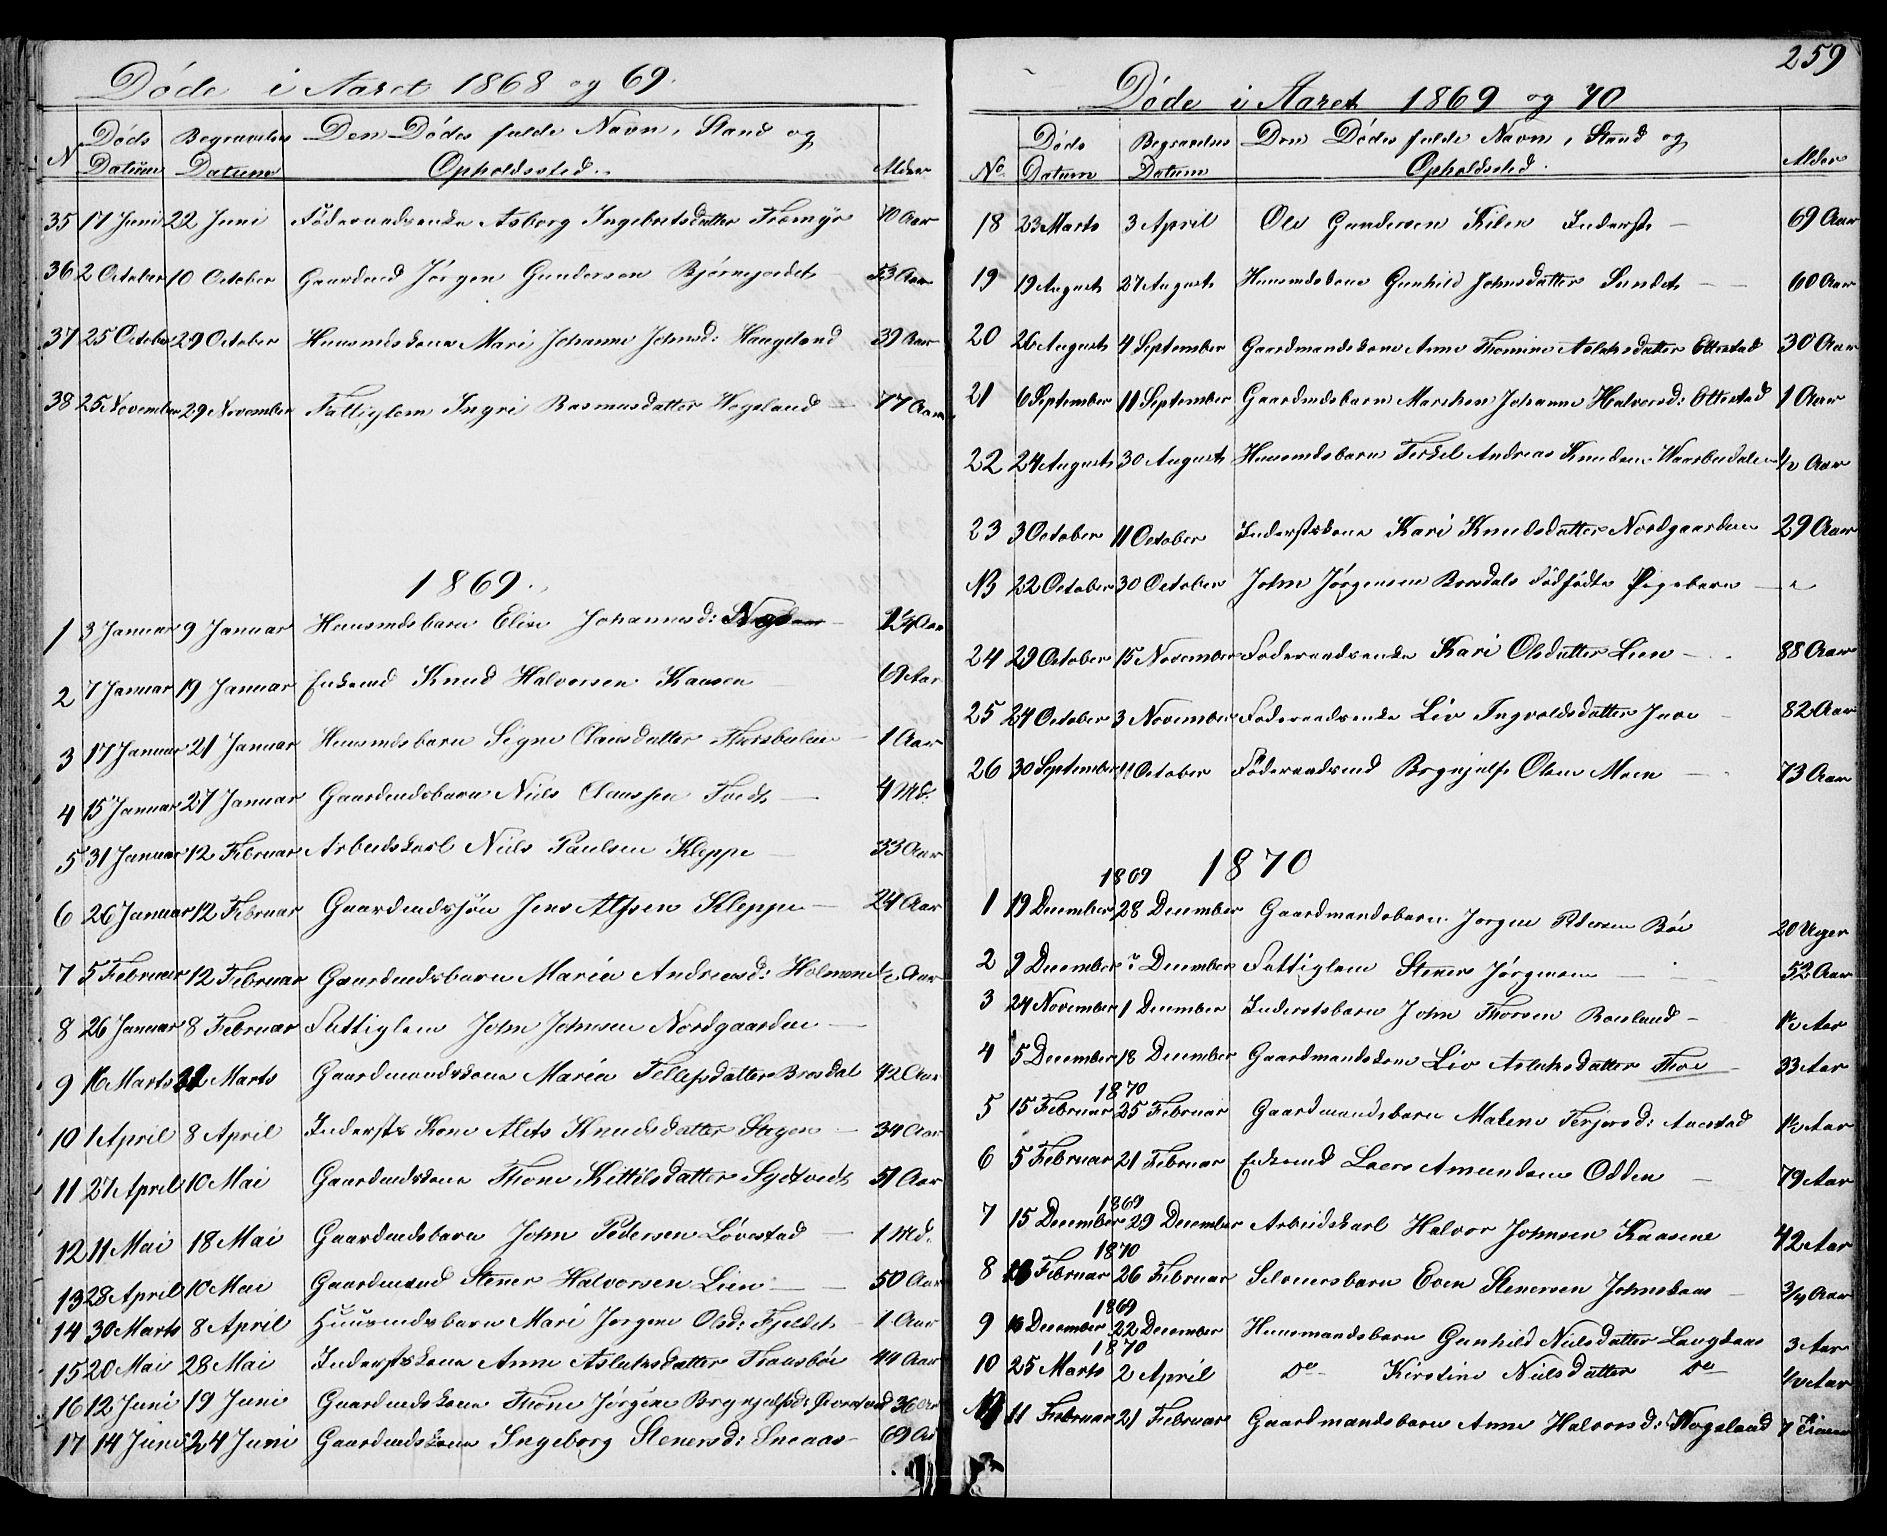 SAKO, Drangedal kirkebøker, G/Gb/L0001: Klokkerbok nr. II 1, 1856-1894, s. 259